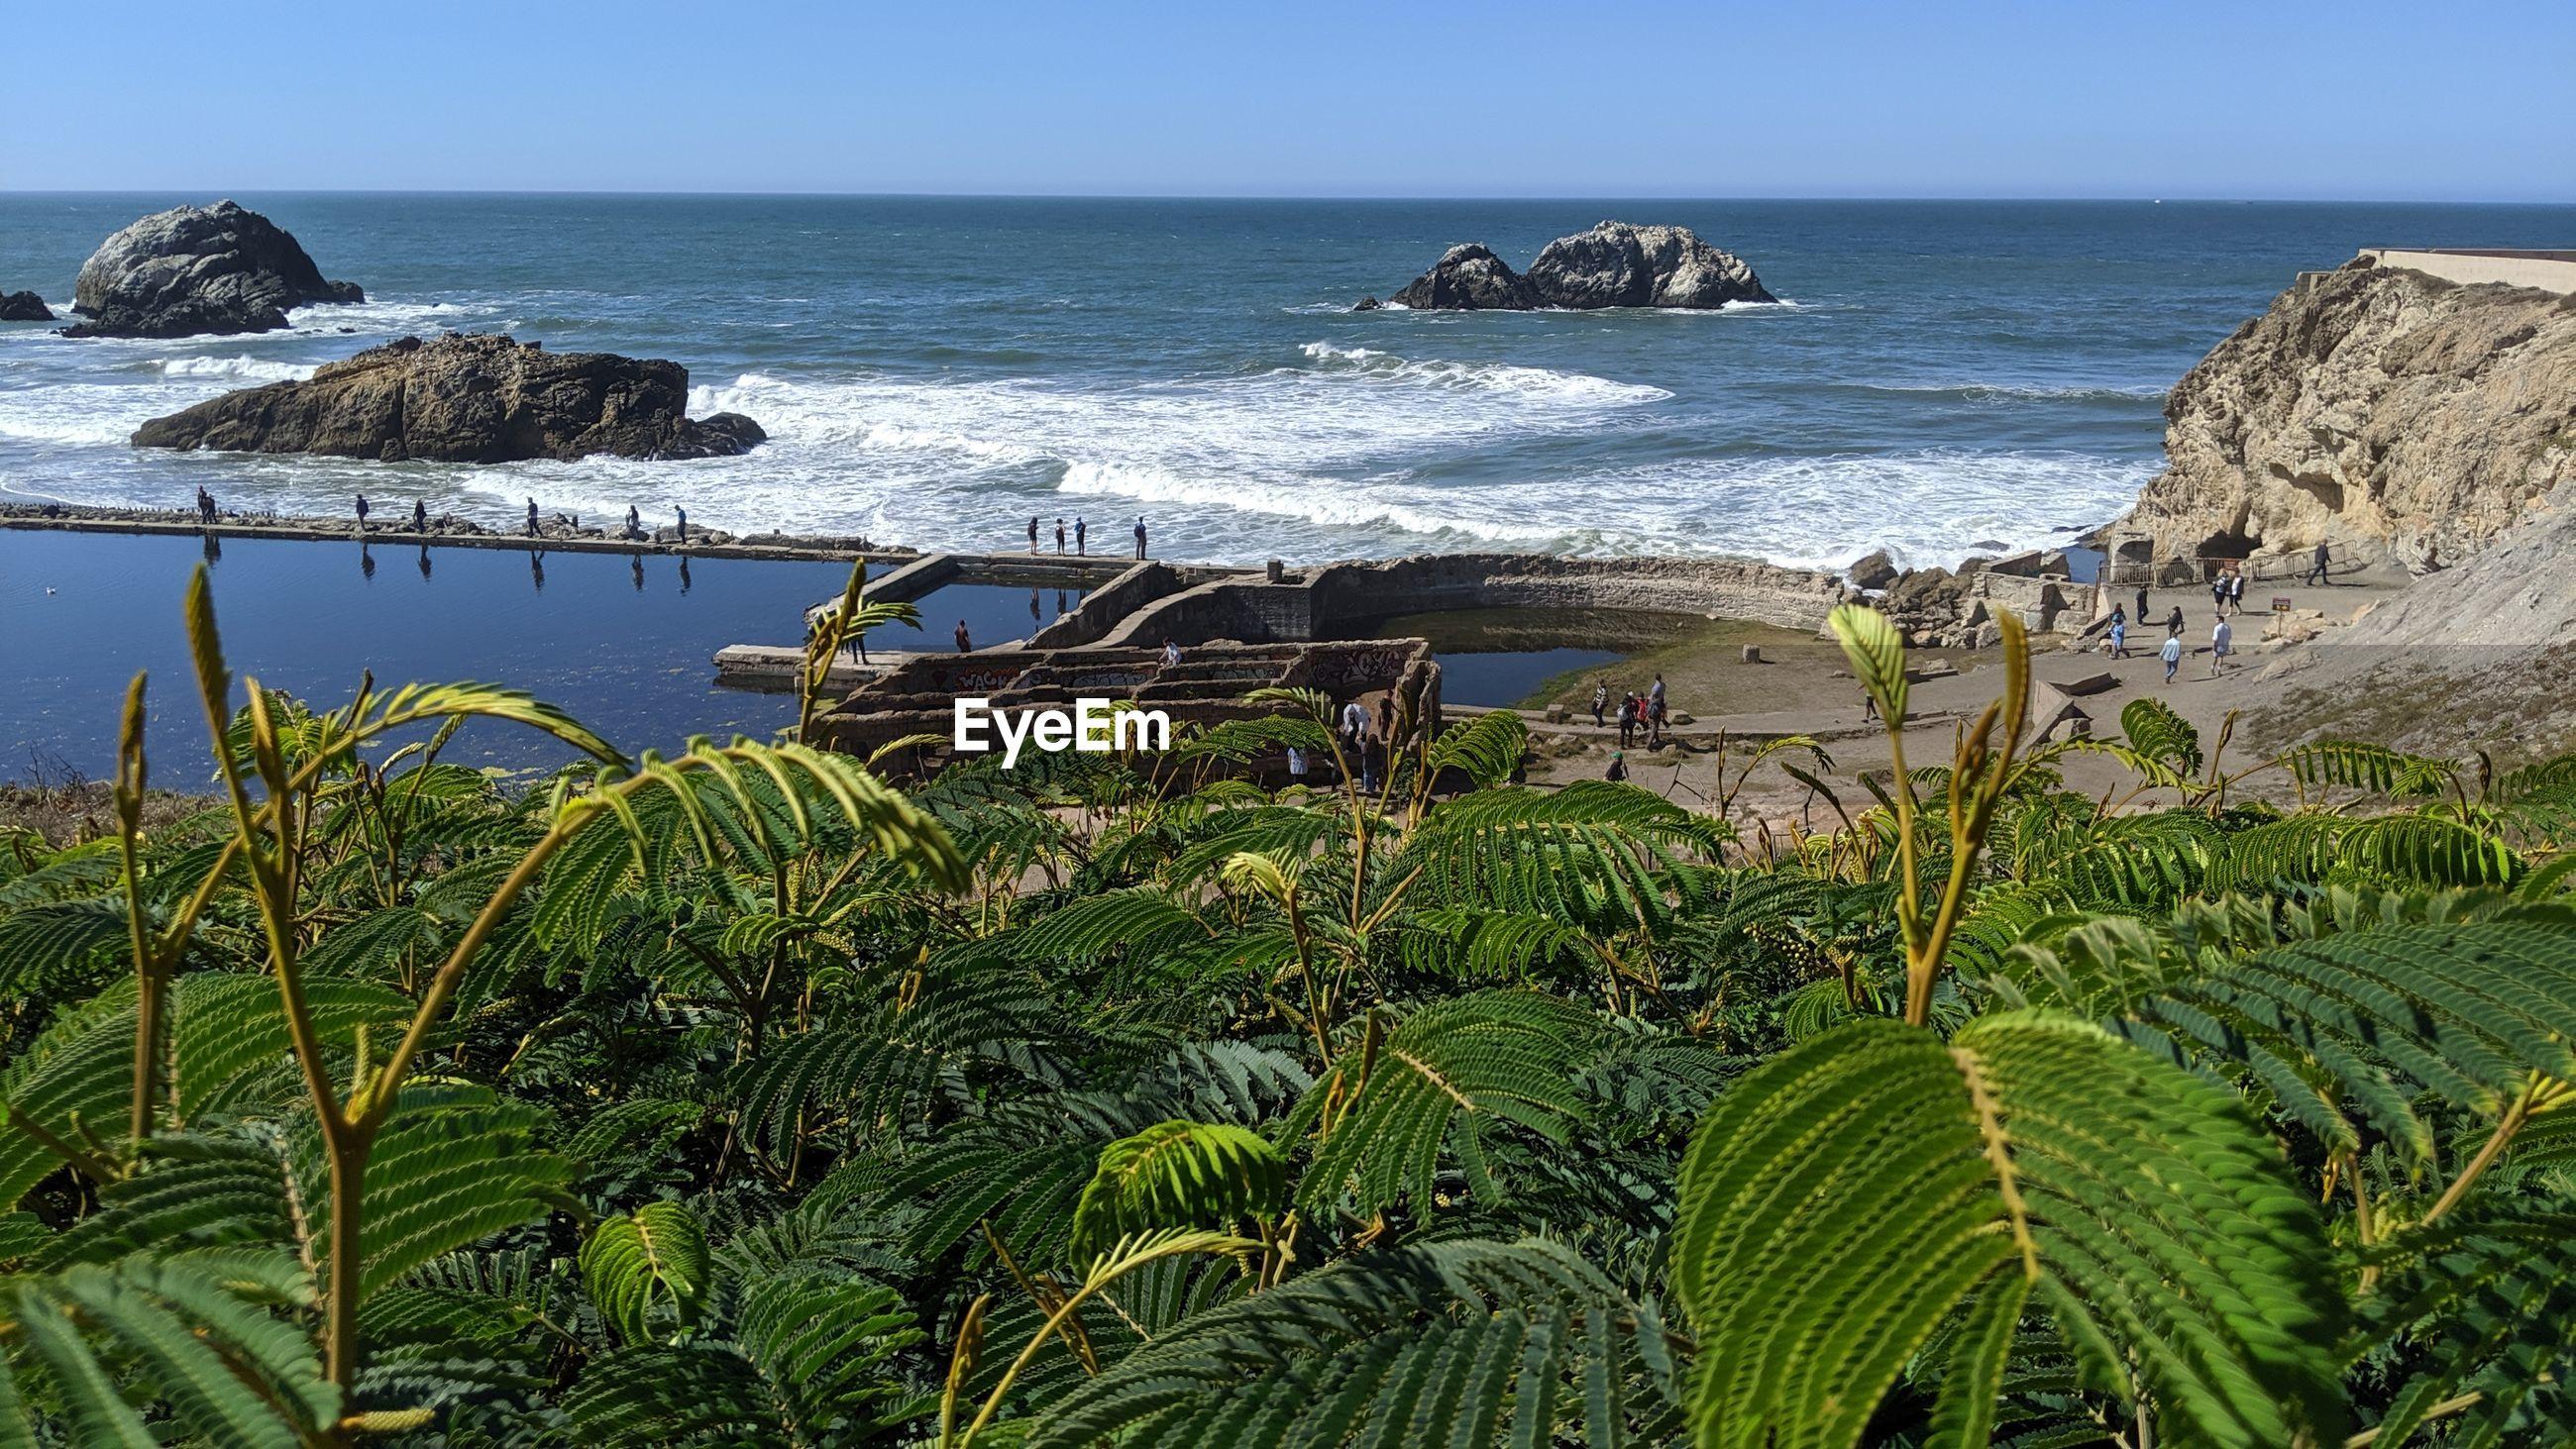 PLANTS GROWING ON BEACH